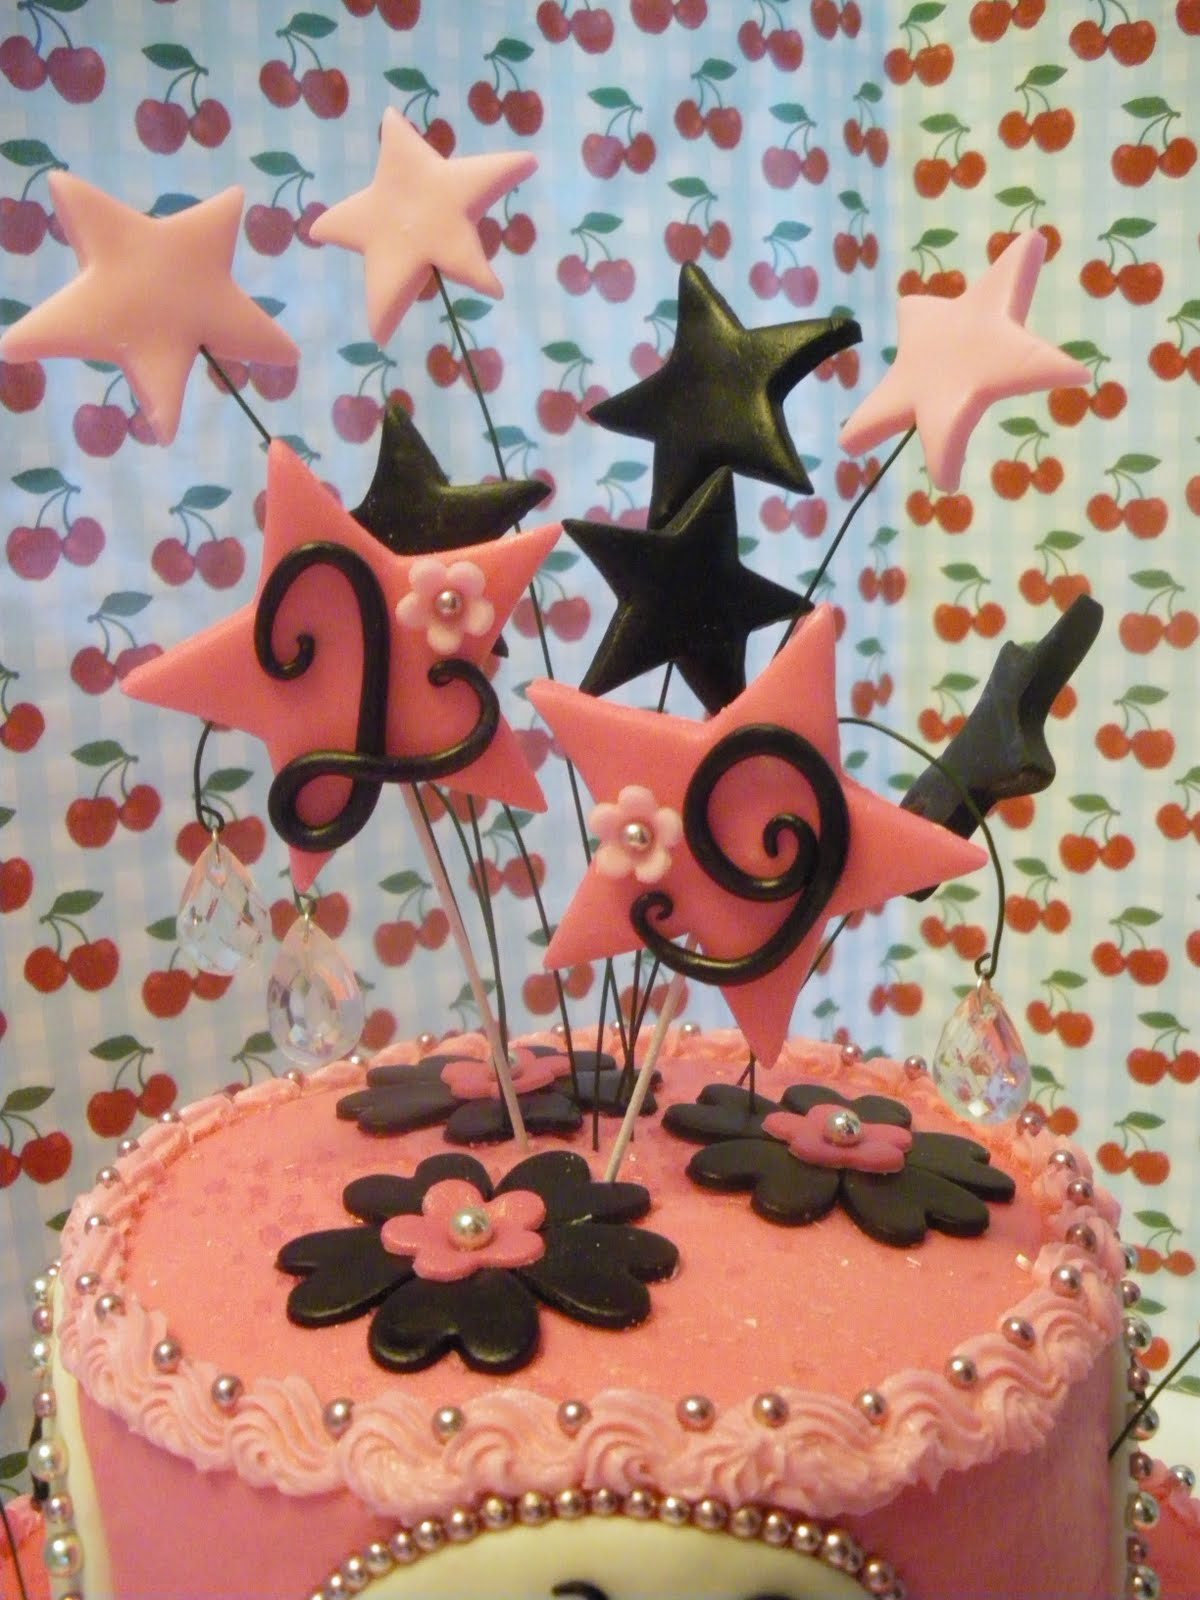 29th Birthday Cake 56797 Usbdata